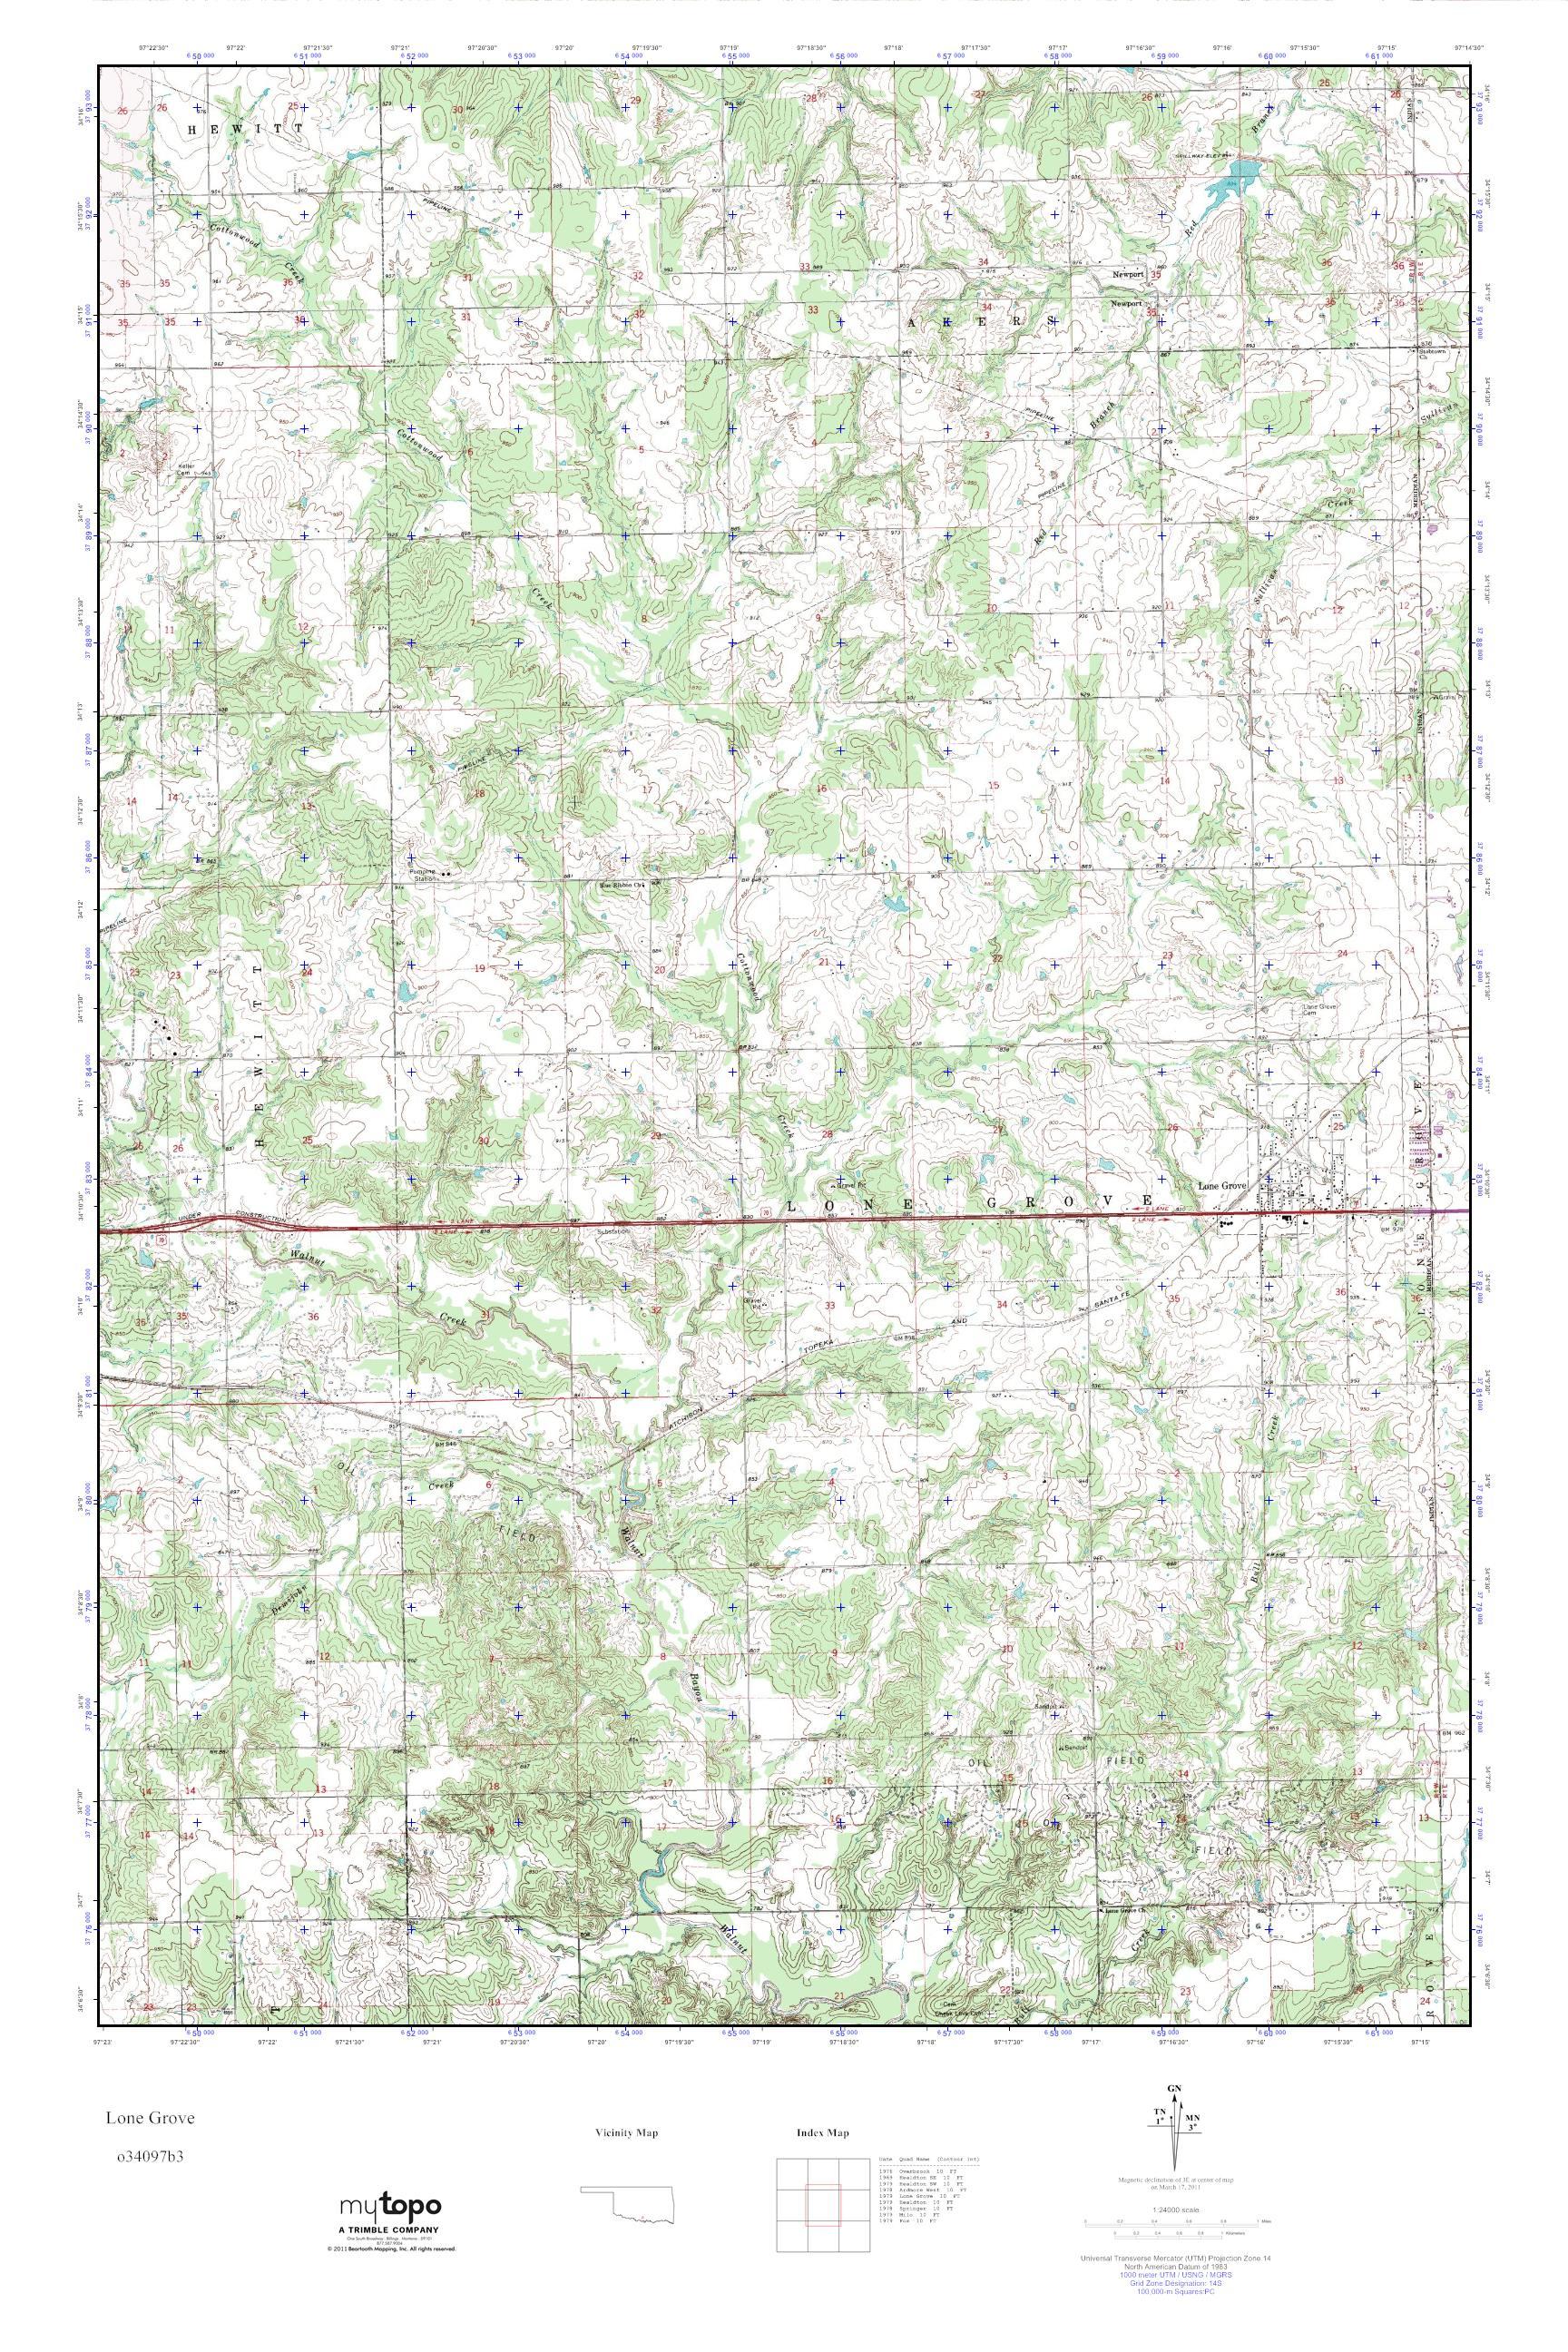 Grove Oklahoma Map.Mytopo Lone Grove Oklahoma Usgs Quad Topo Map